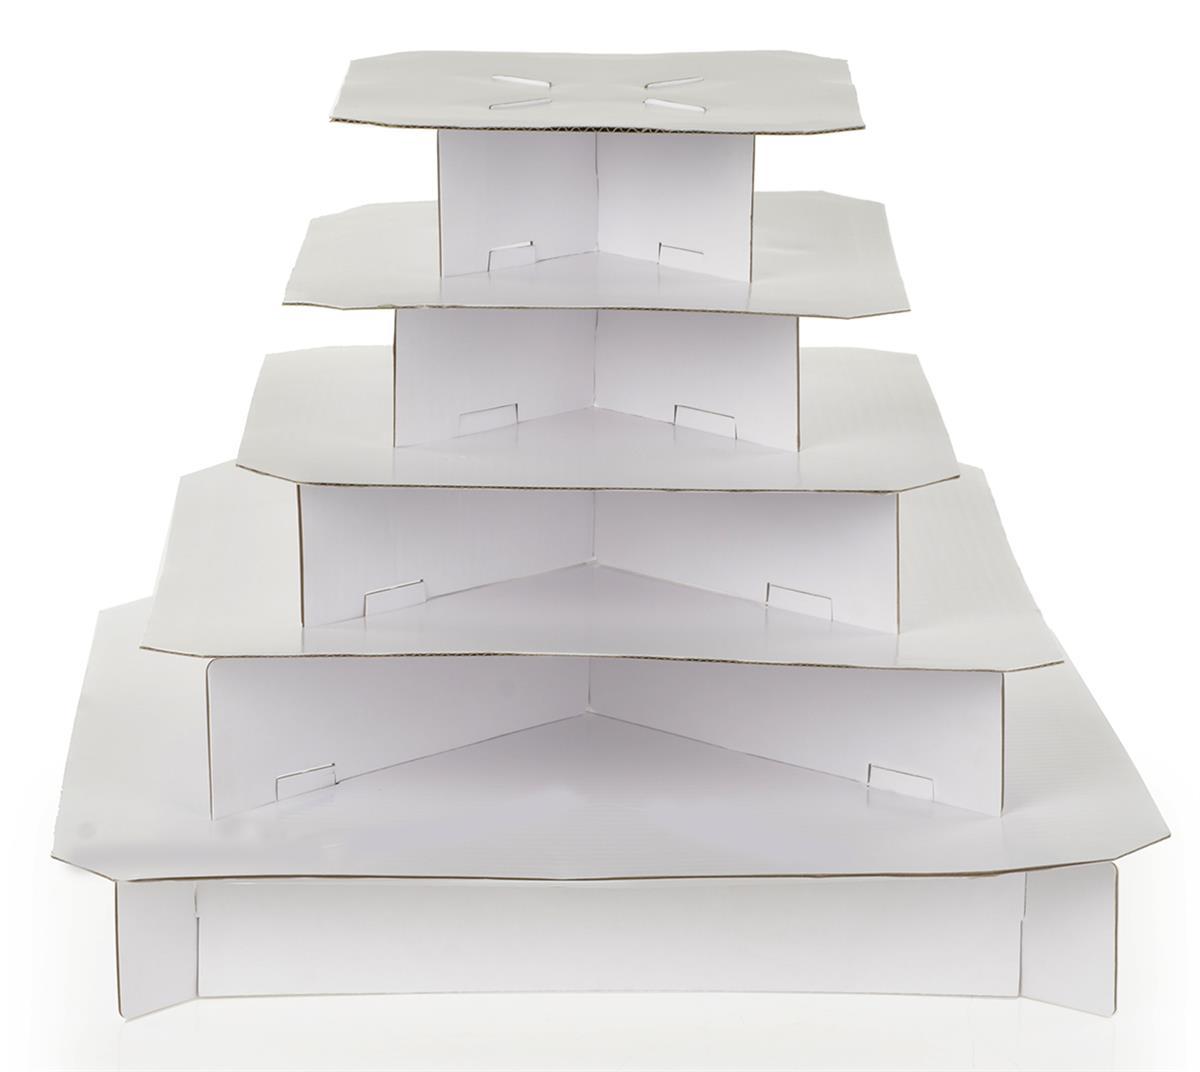 Square Cupcake Stand Classic White 5 Tier Cardboard